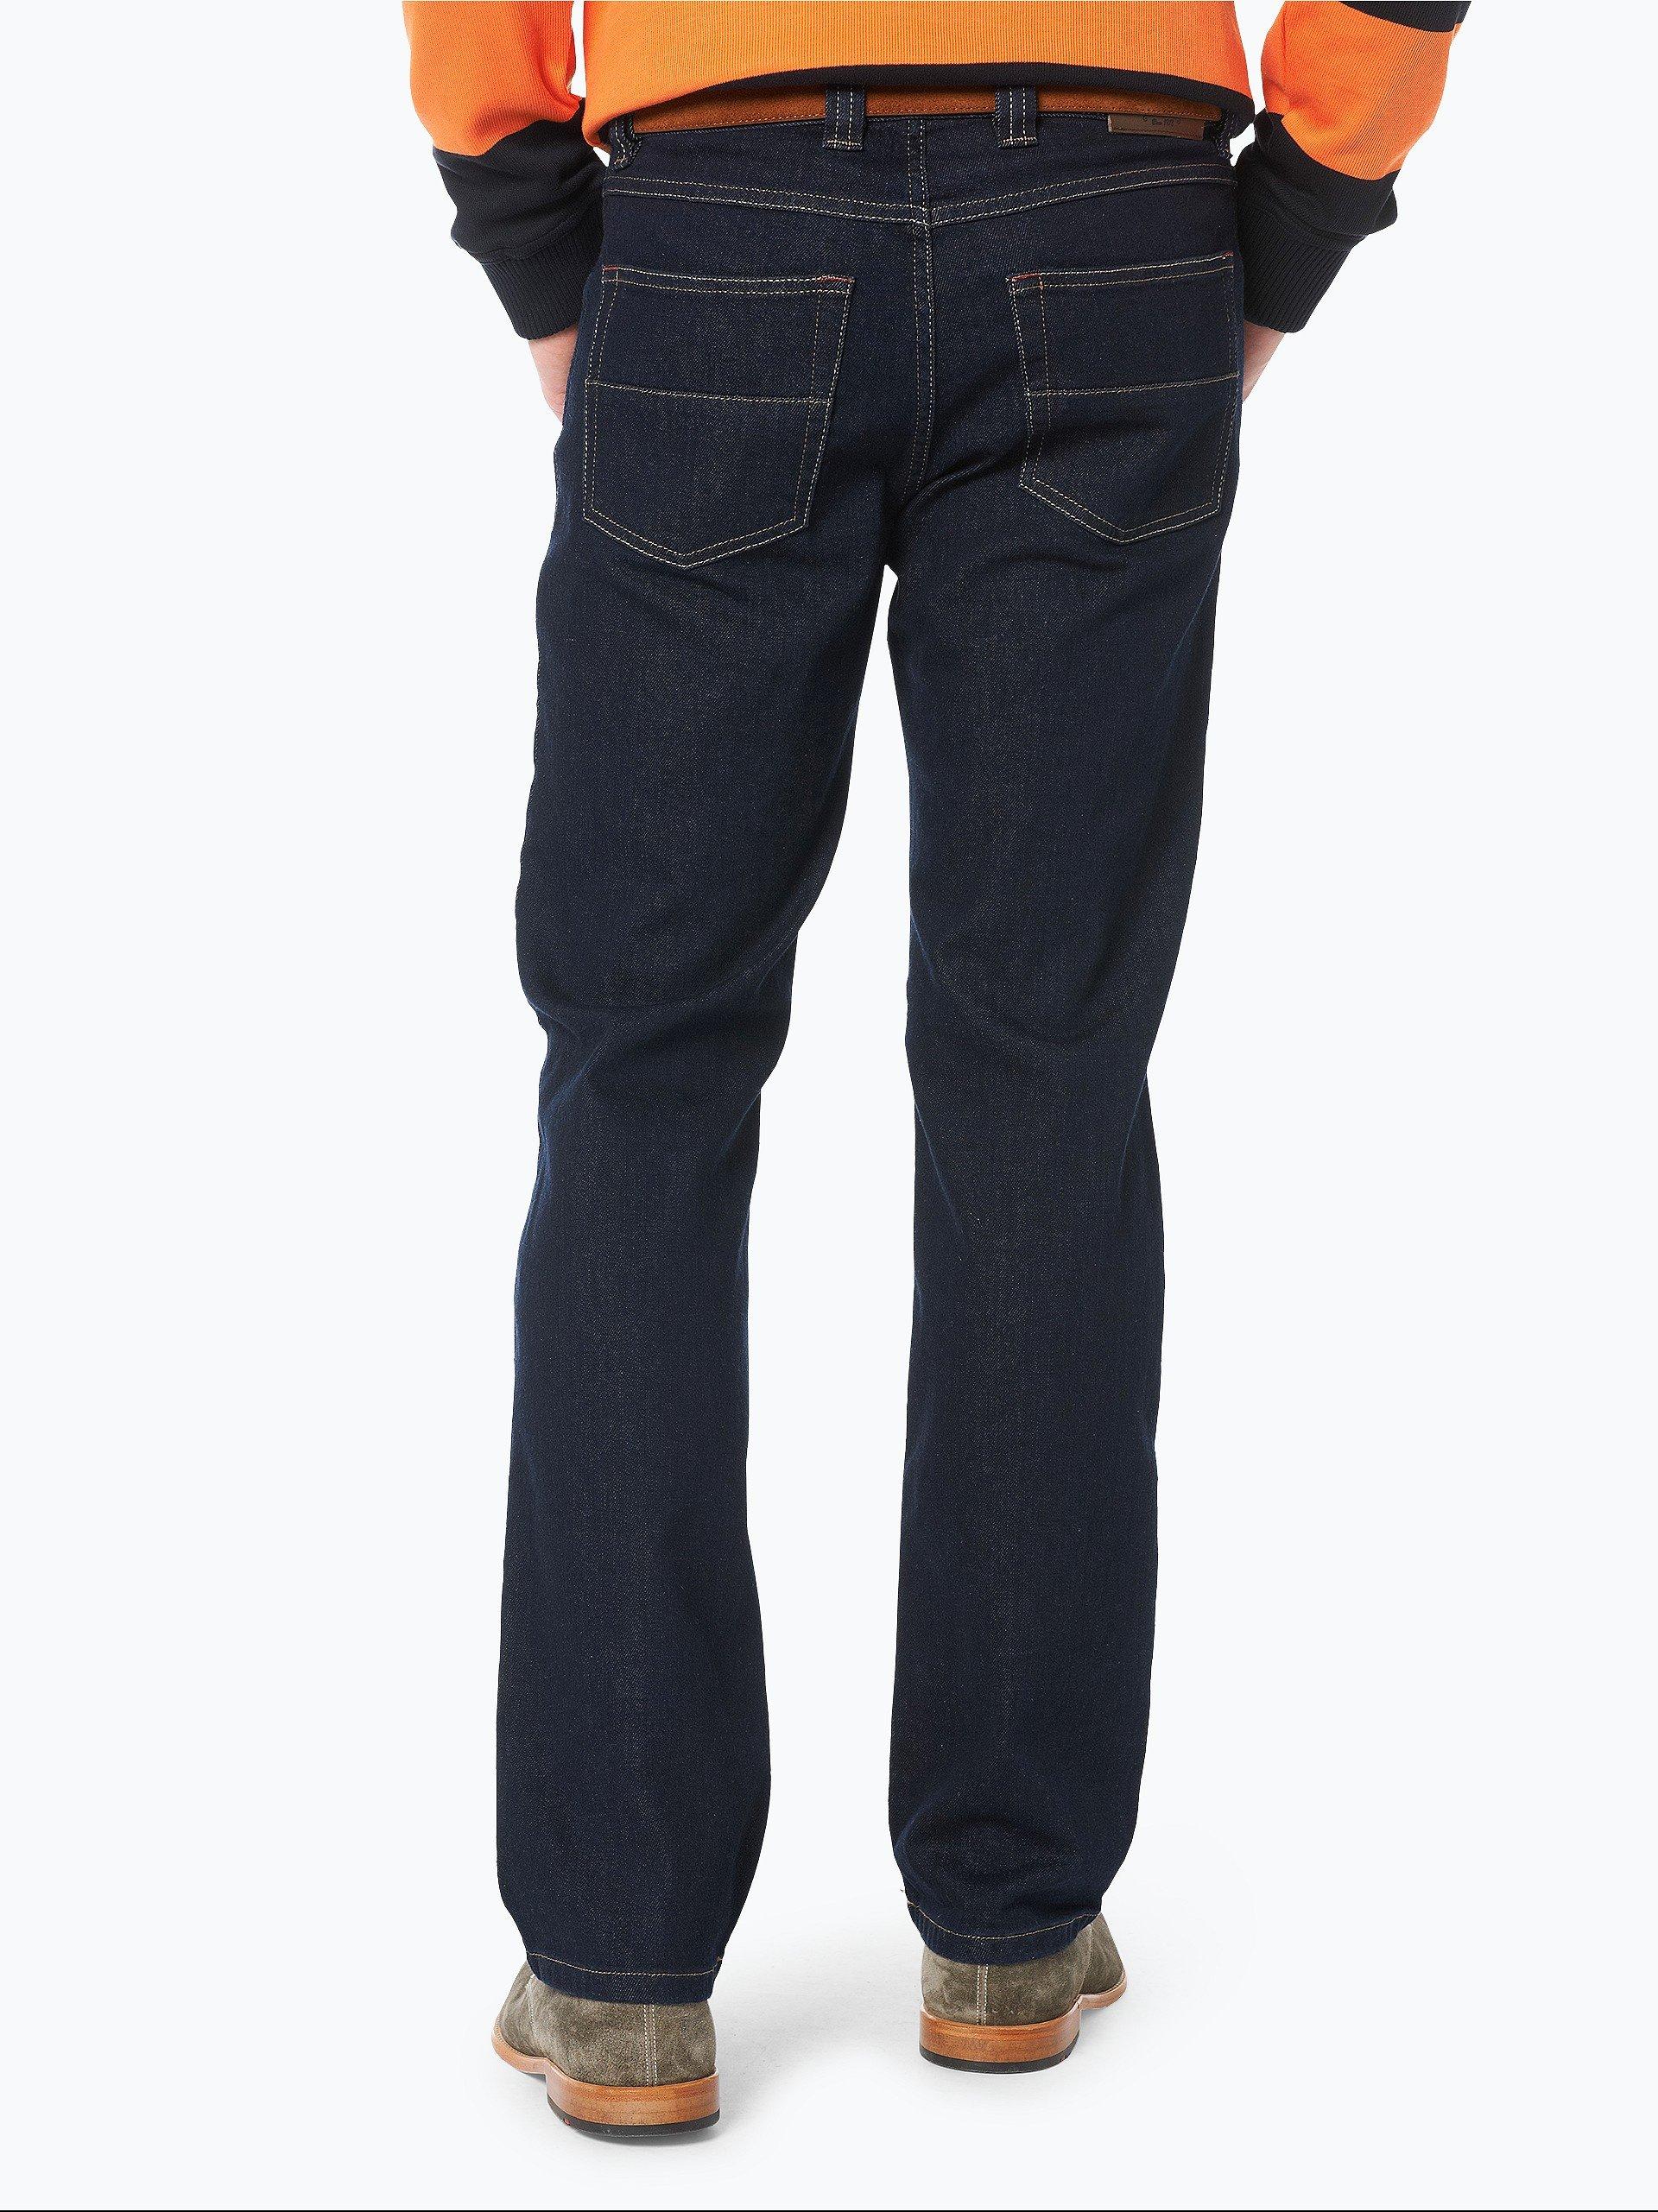 Bugatti Herren Jeans - Nevada